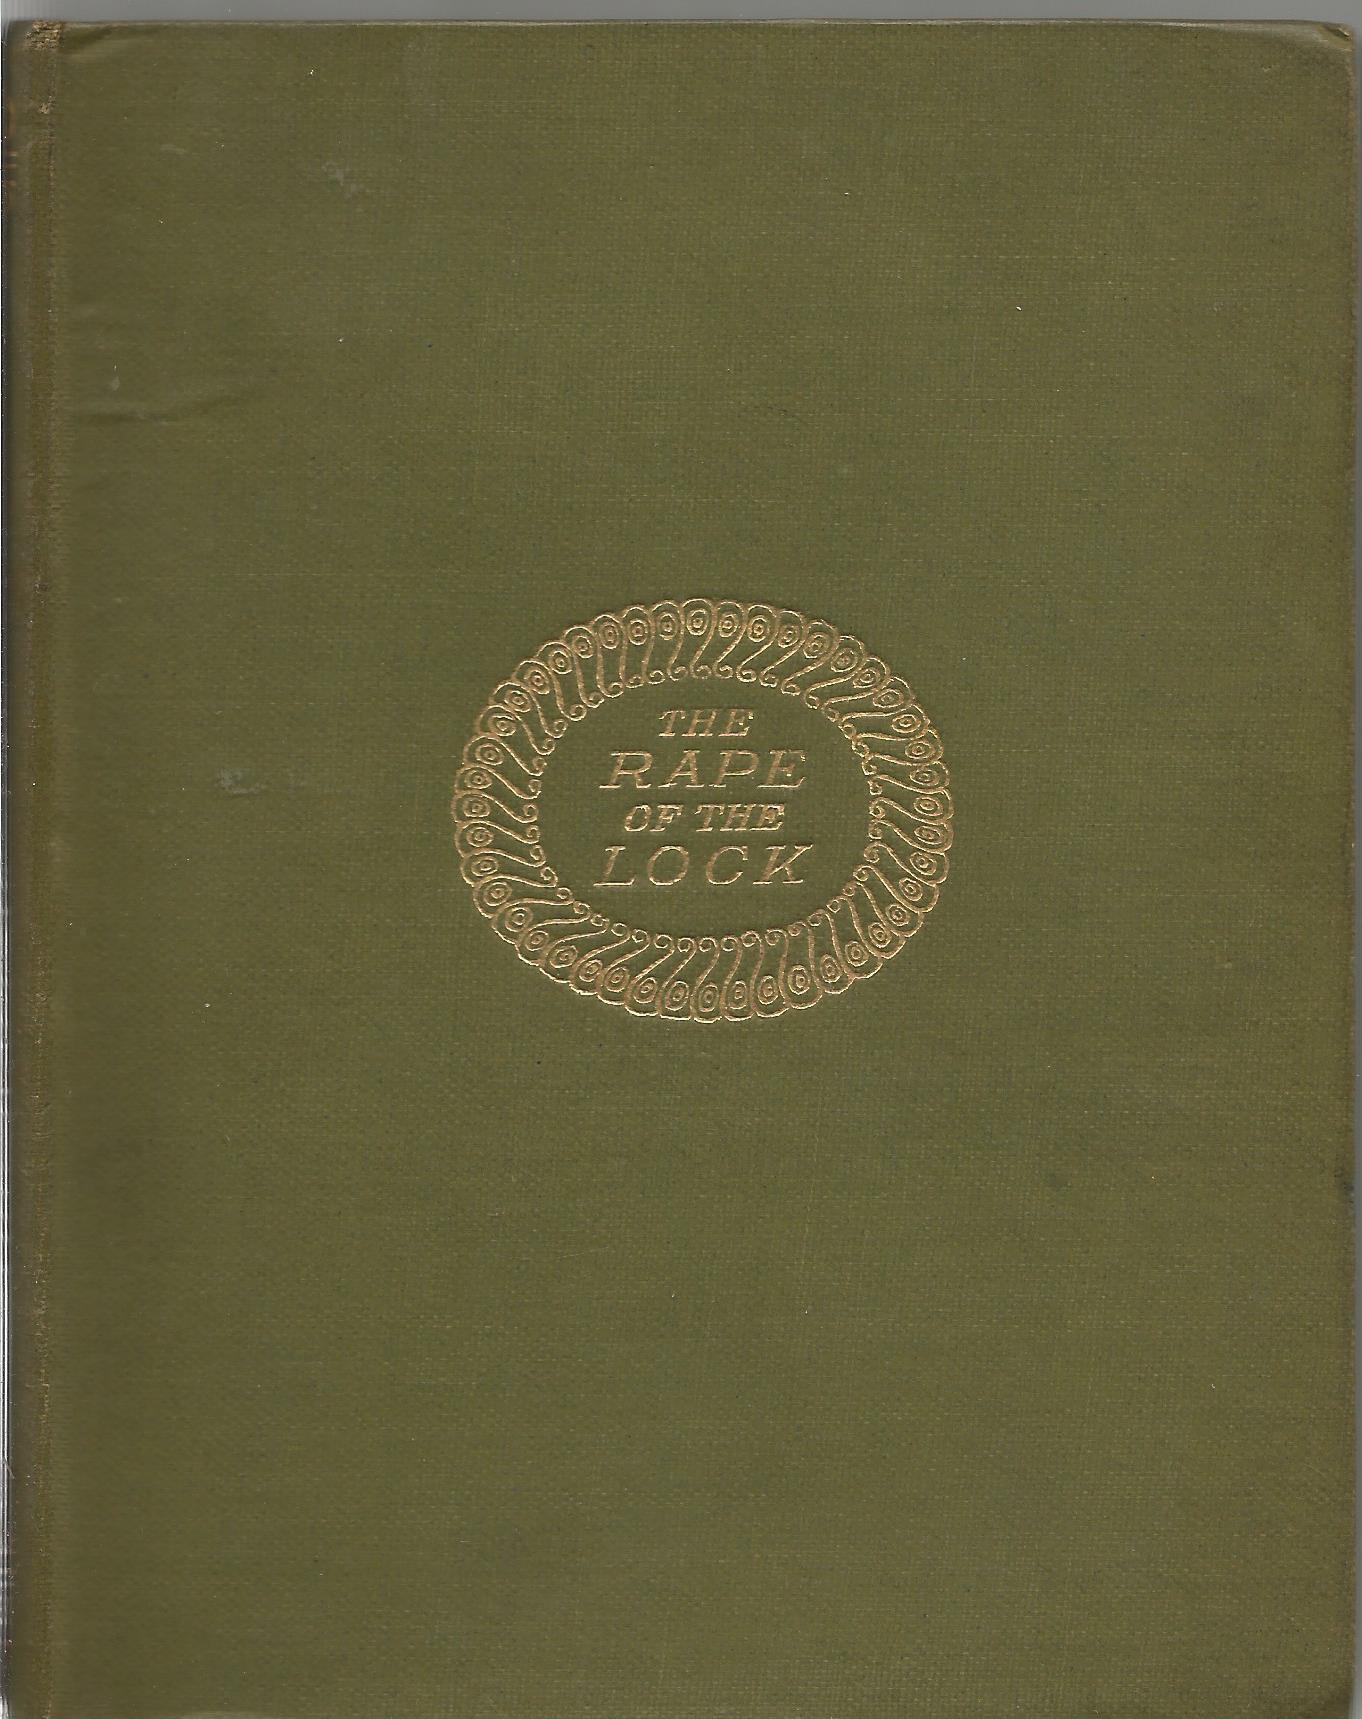 Hardback Book The Rape of The Lock by Alexander Pope Illustrations by Aubrey Beardsley 1916 Second